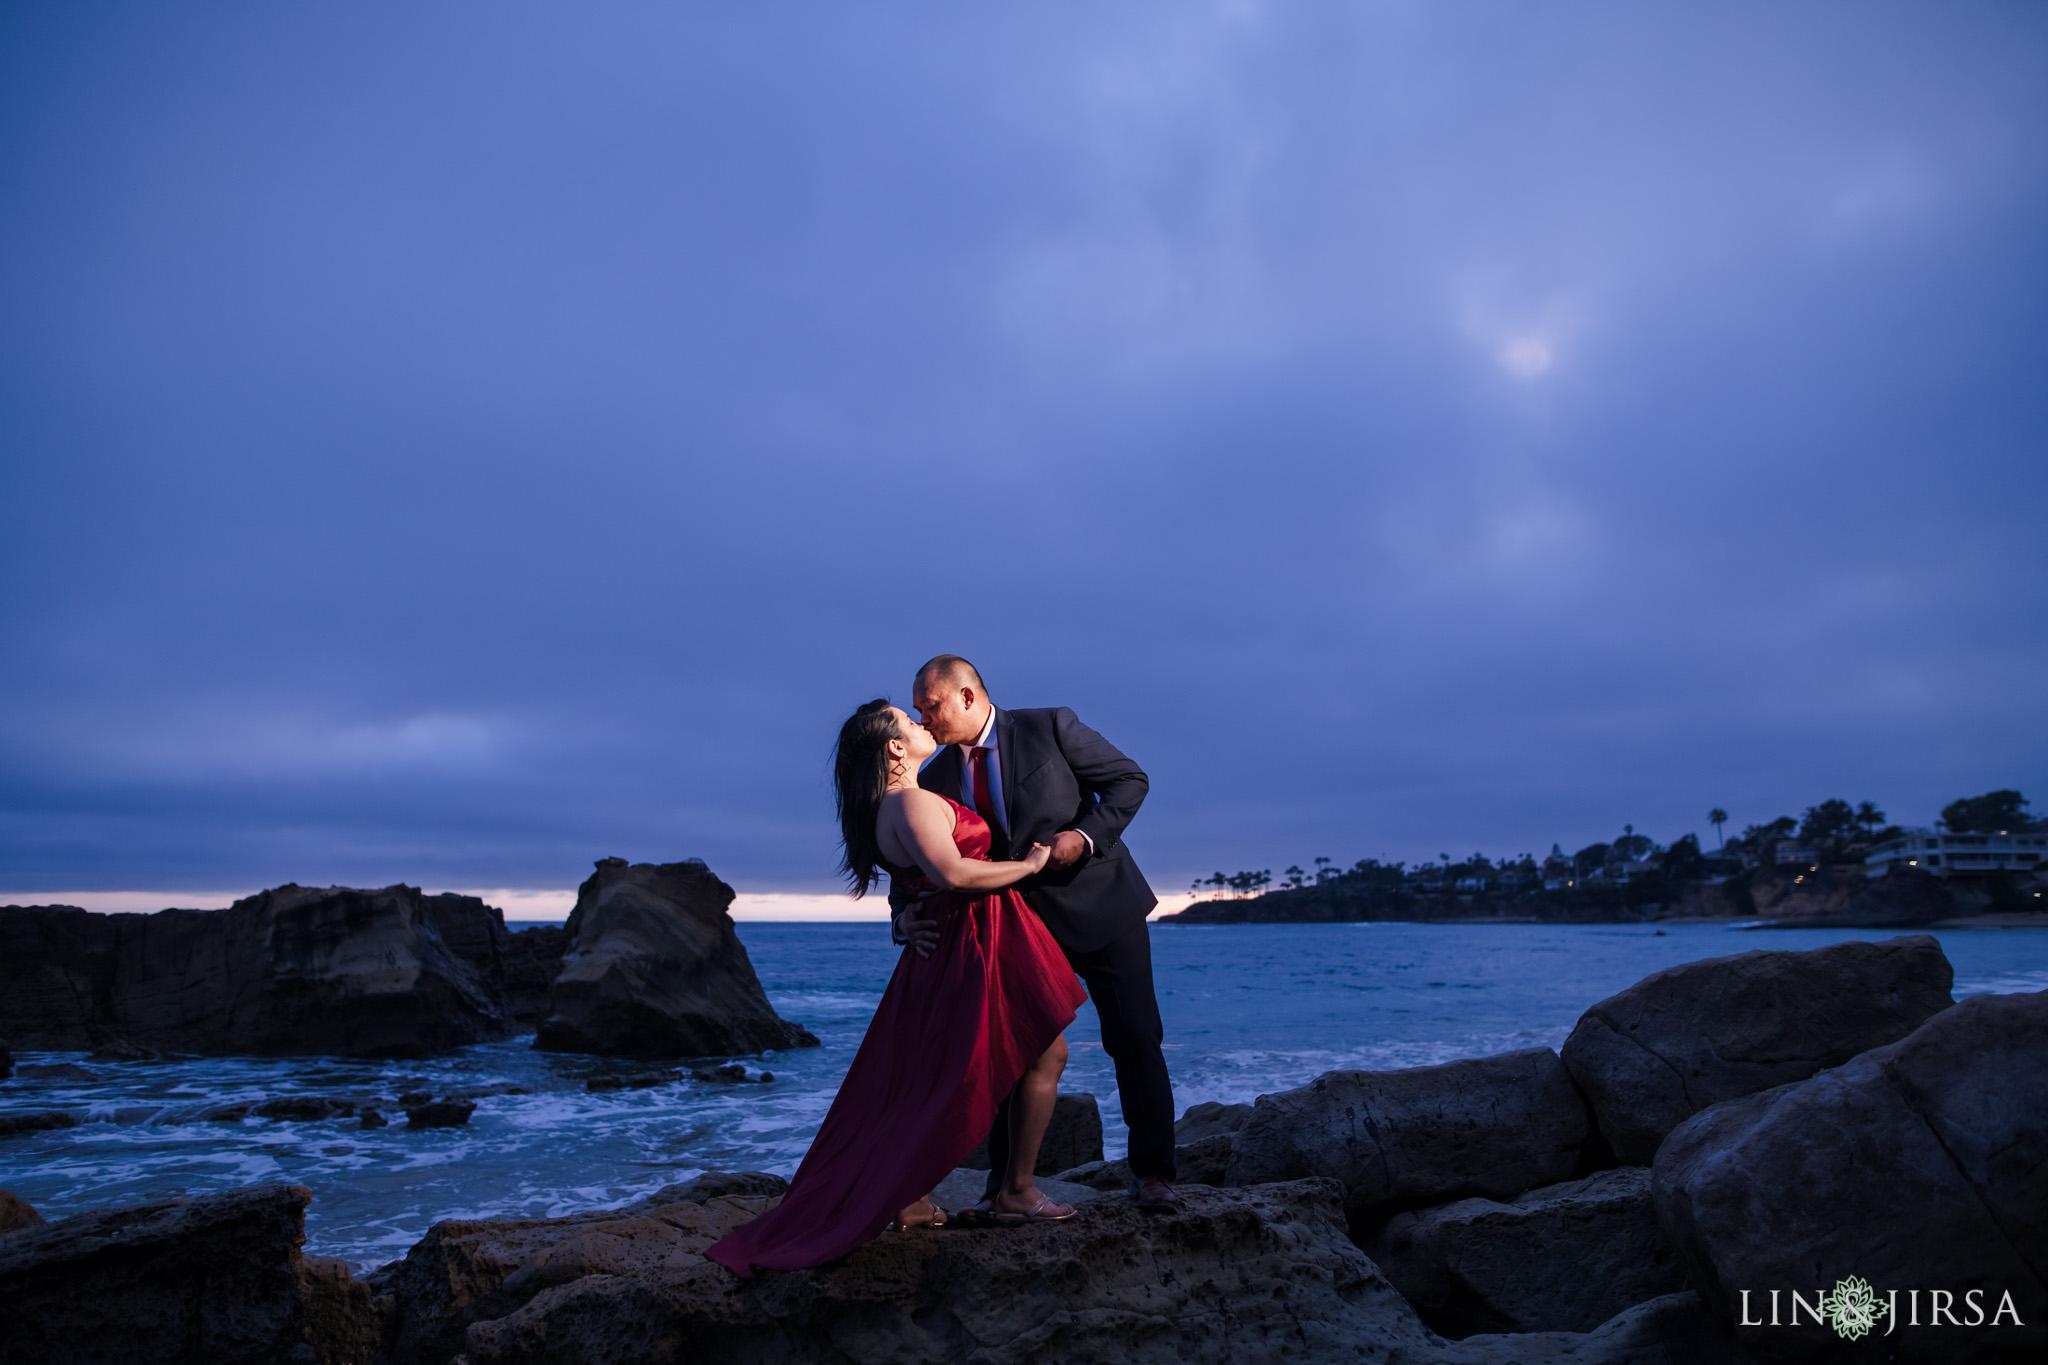 09 Heisler Park Orange County Engagement Photographer